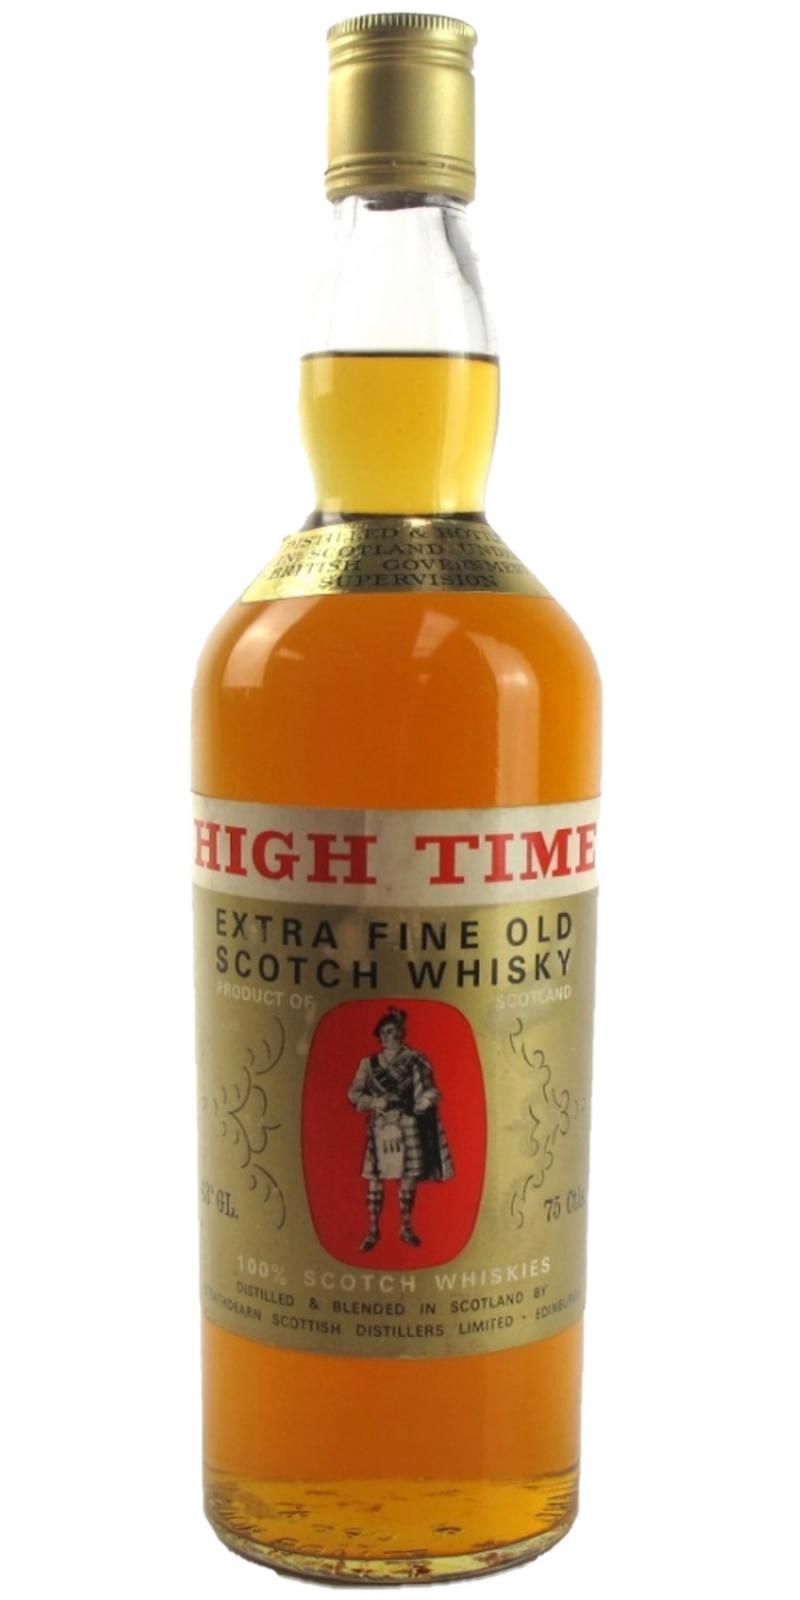 High Time Extra Fine Old Scotch Whisky